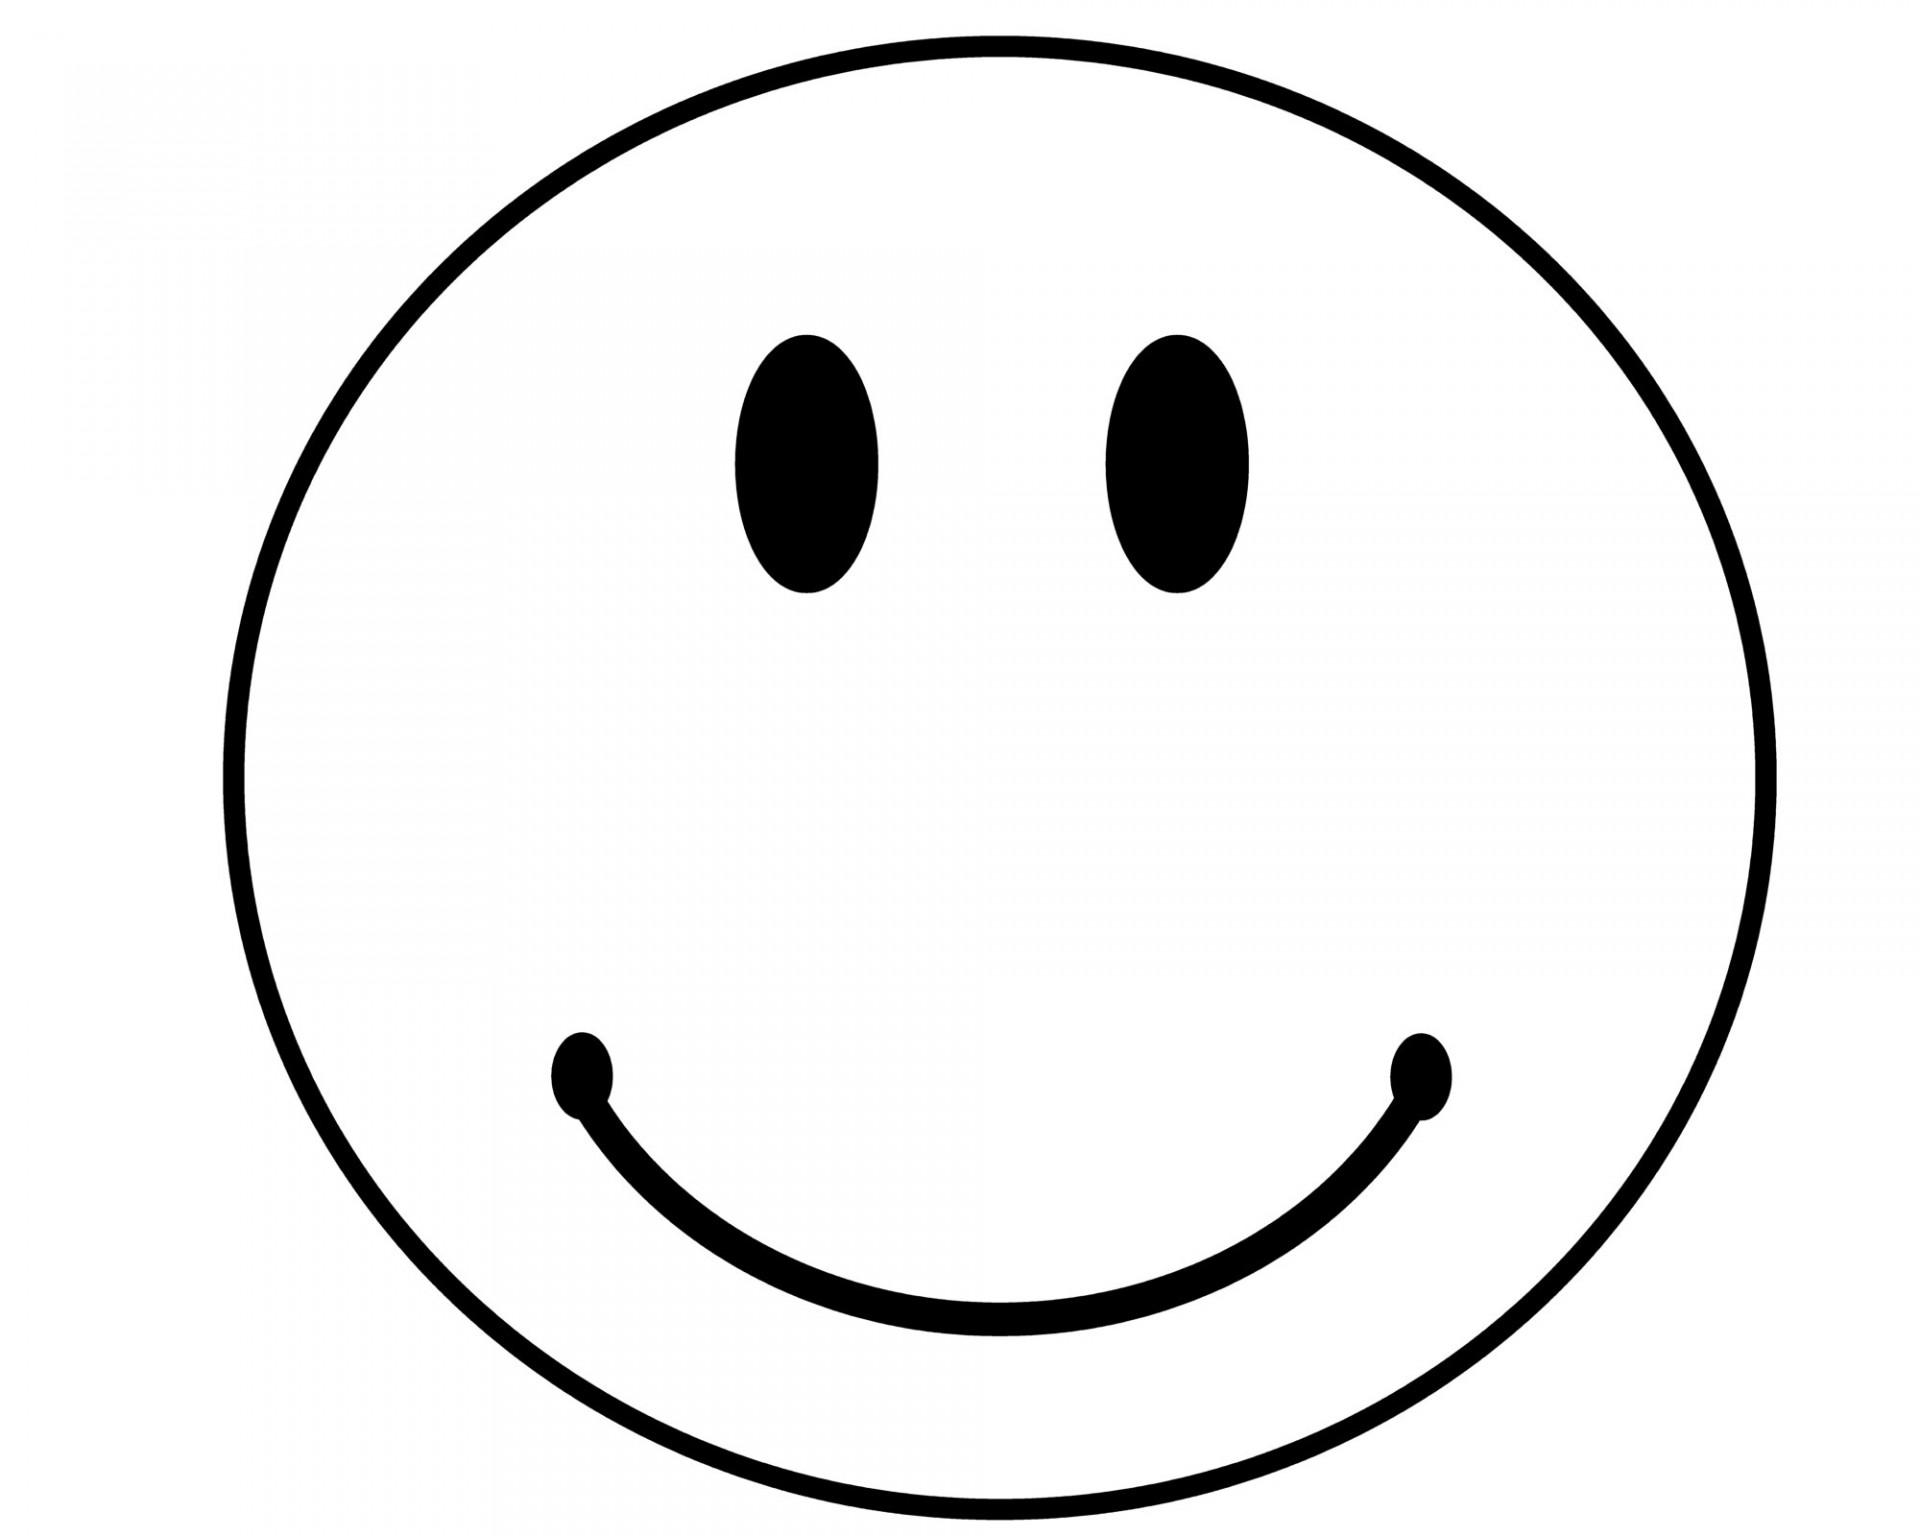 Free Clip Art Smiley Face Tumundografico-Free clip art smiley face tumundografico-5